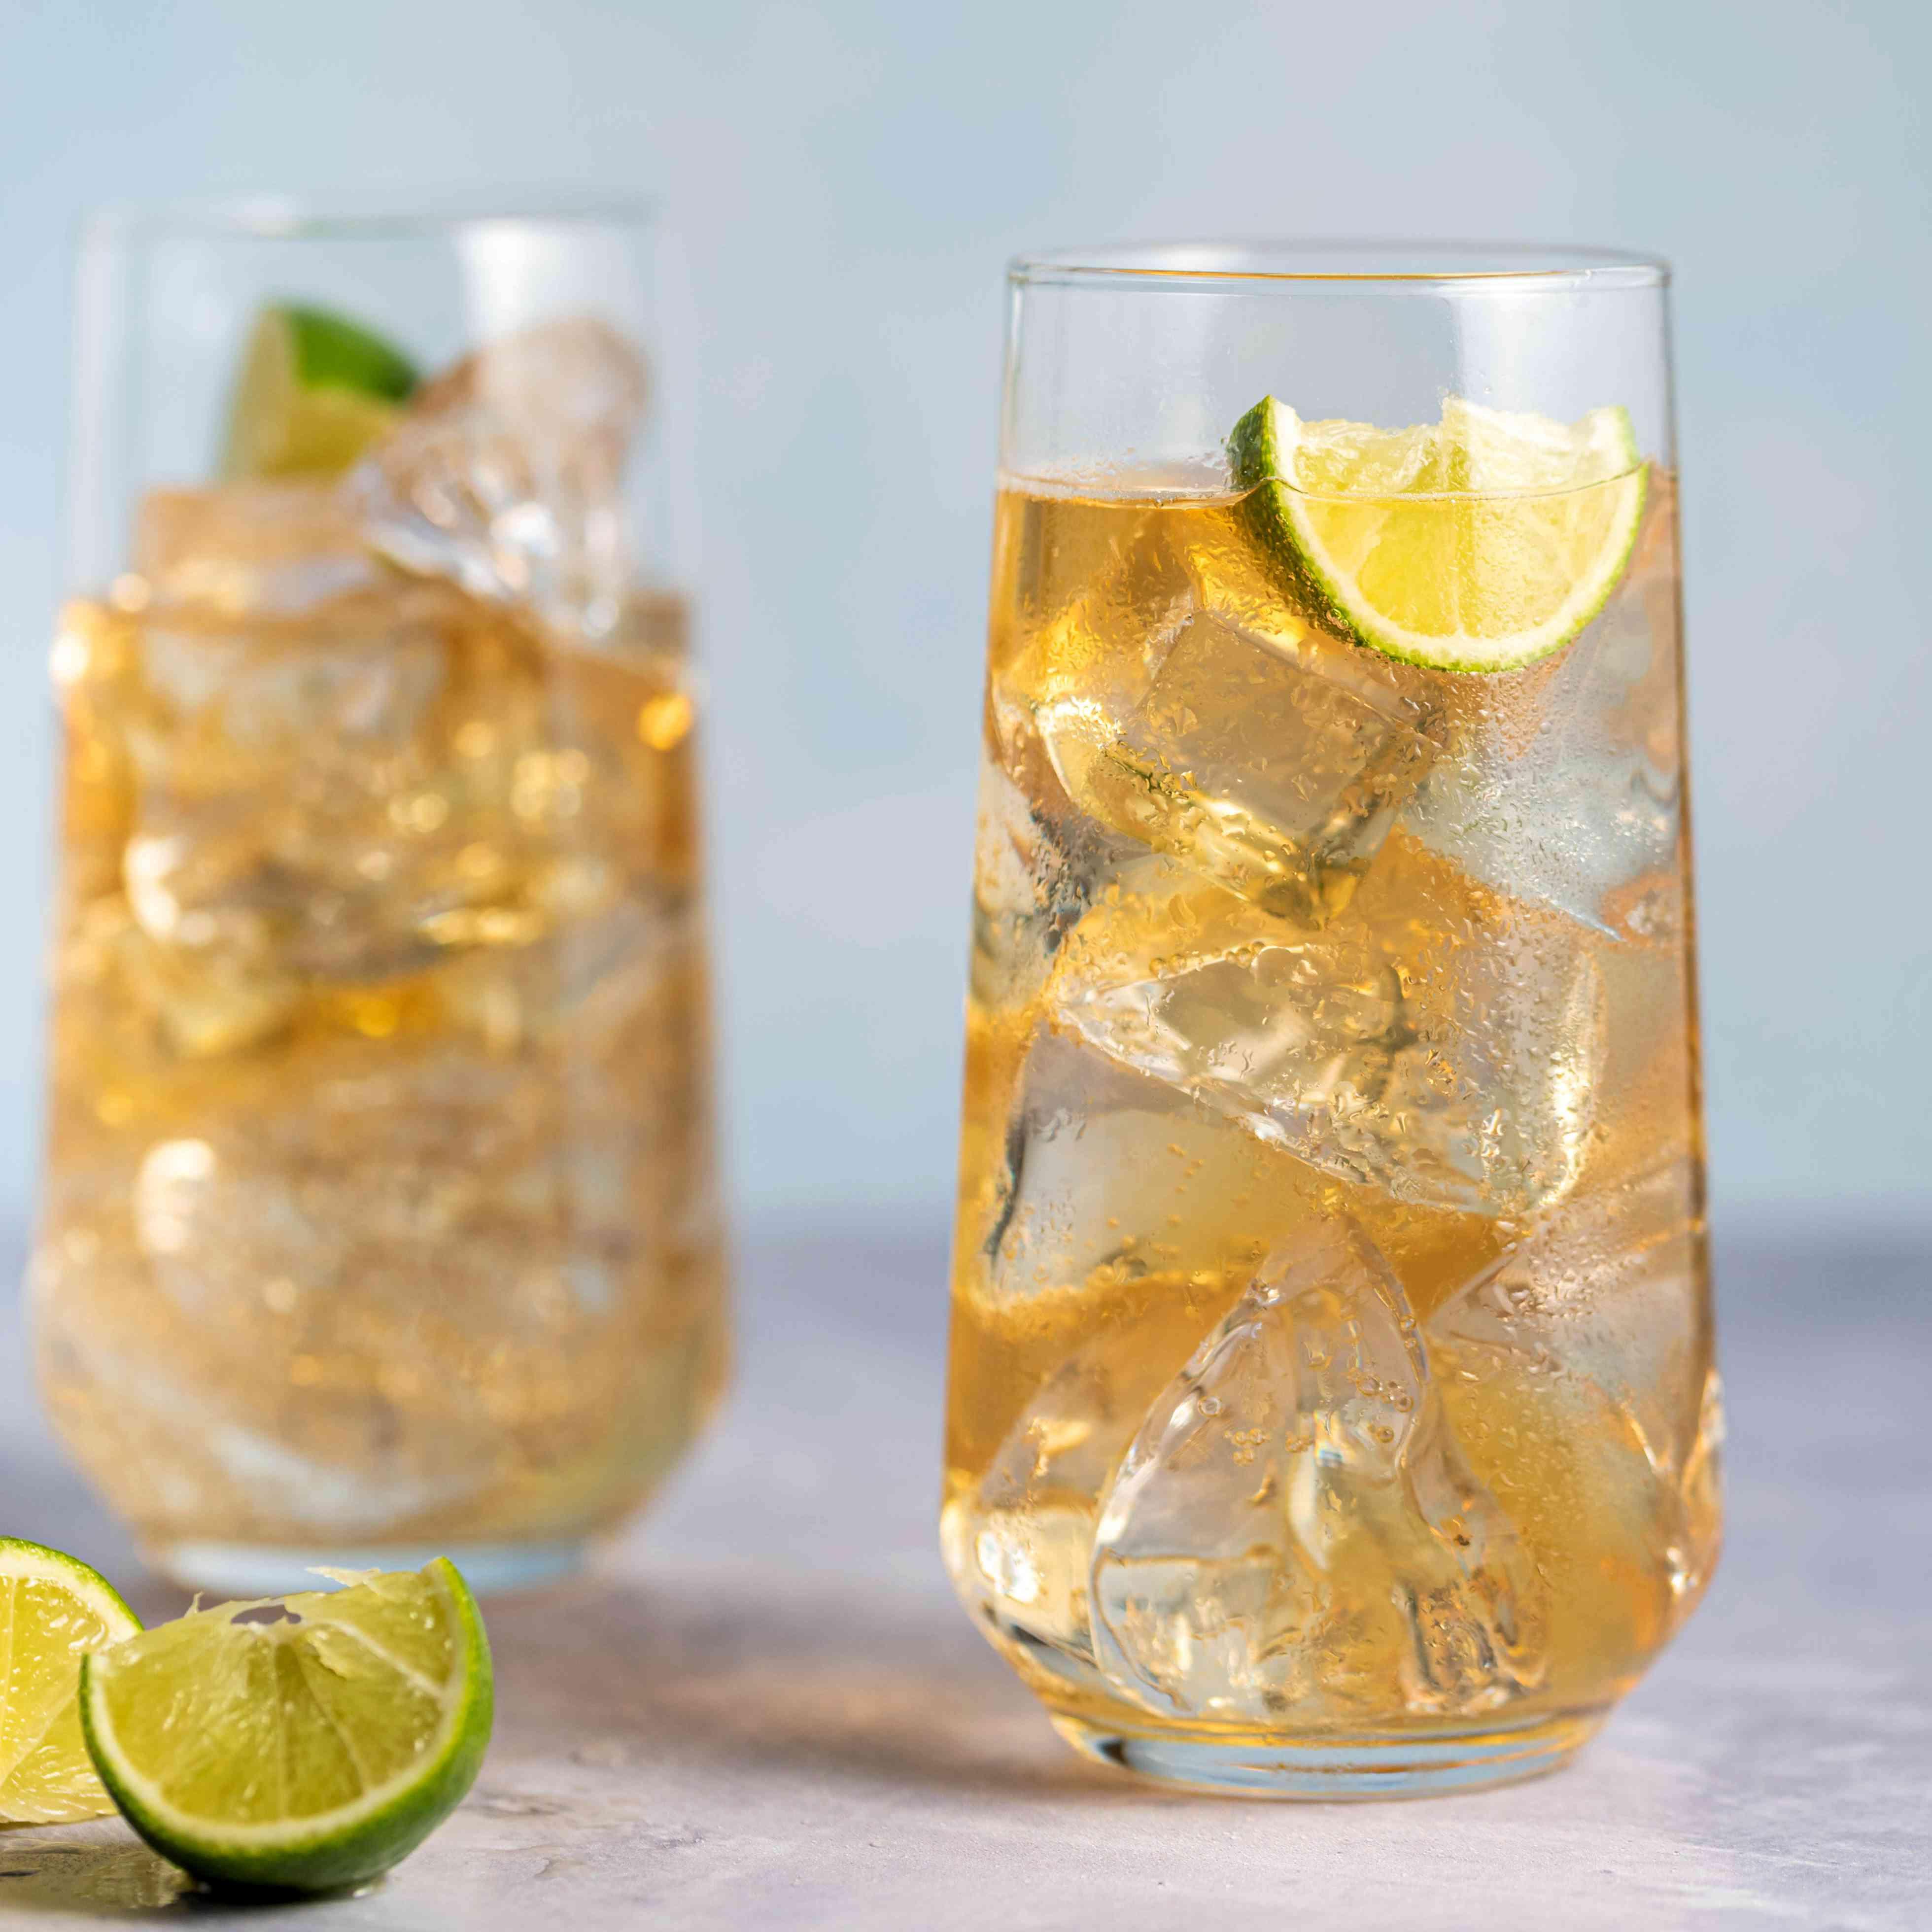 Irish whiskey and ginger ale